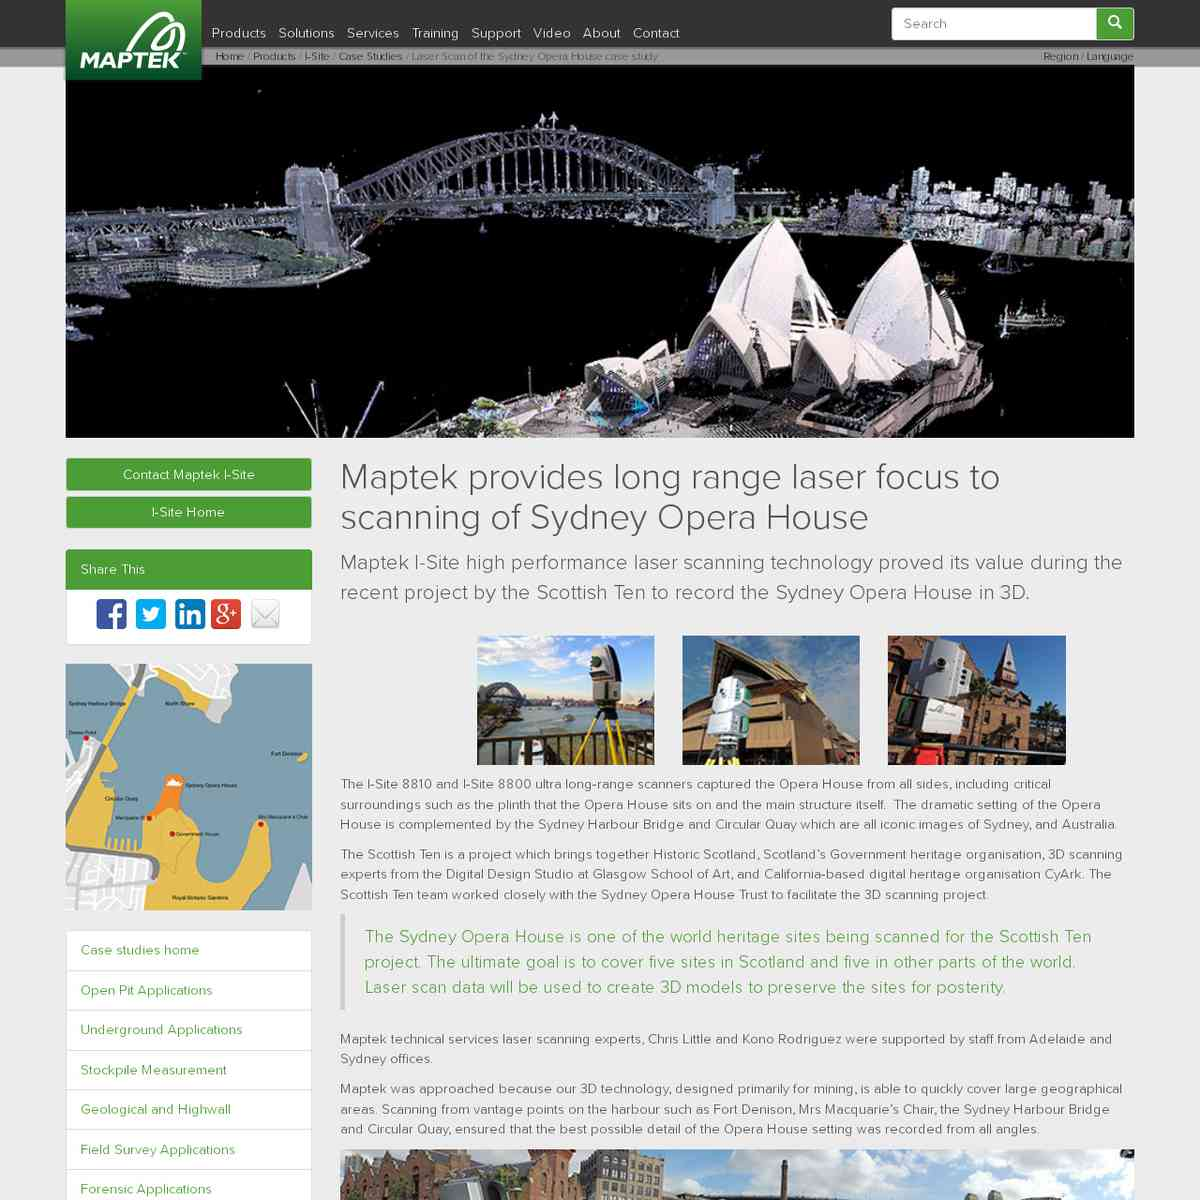 maptek.com/products/i-site/case_studies/sydney_opera_house.html